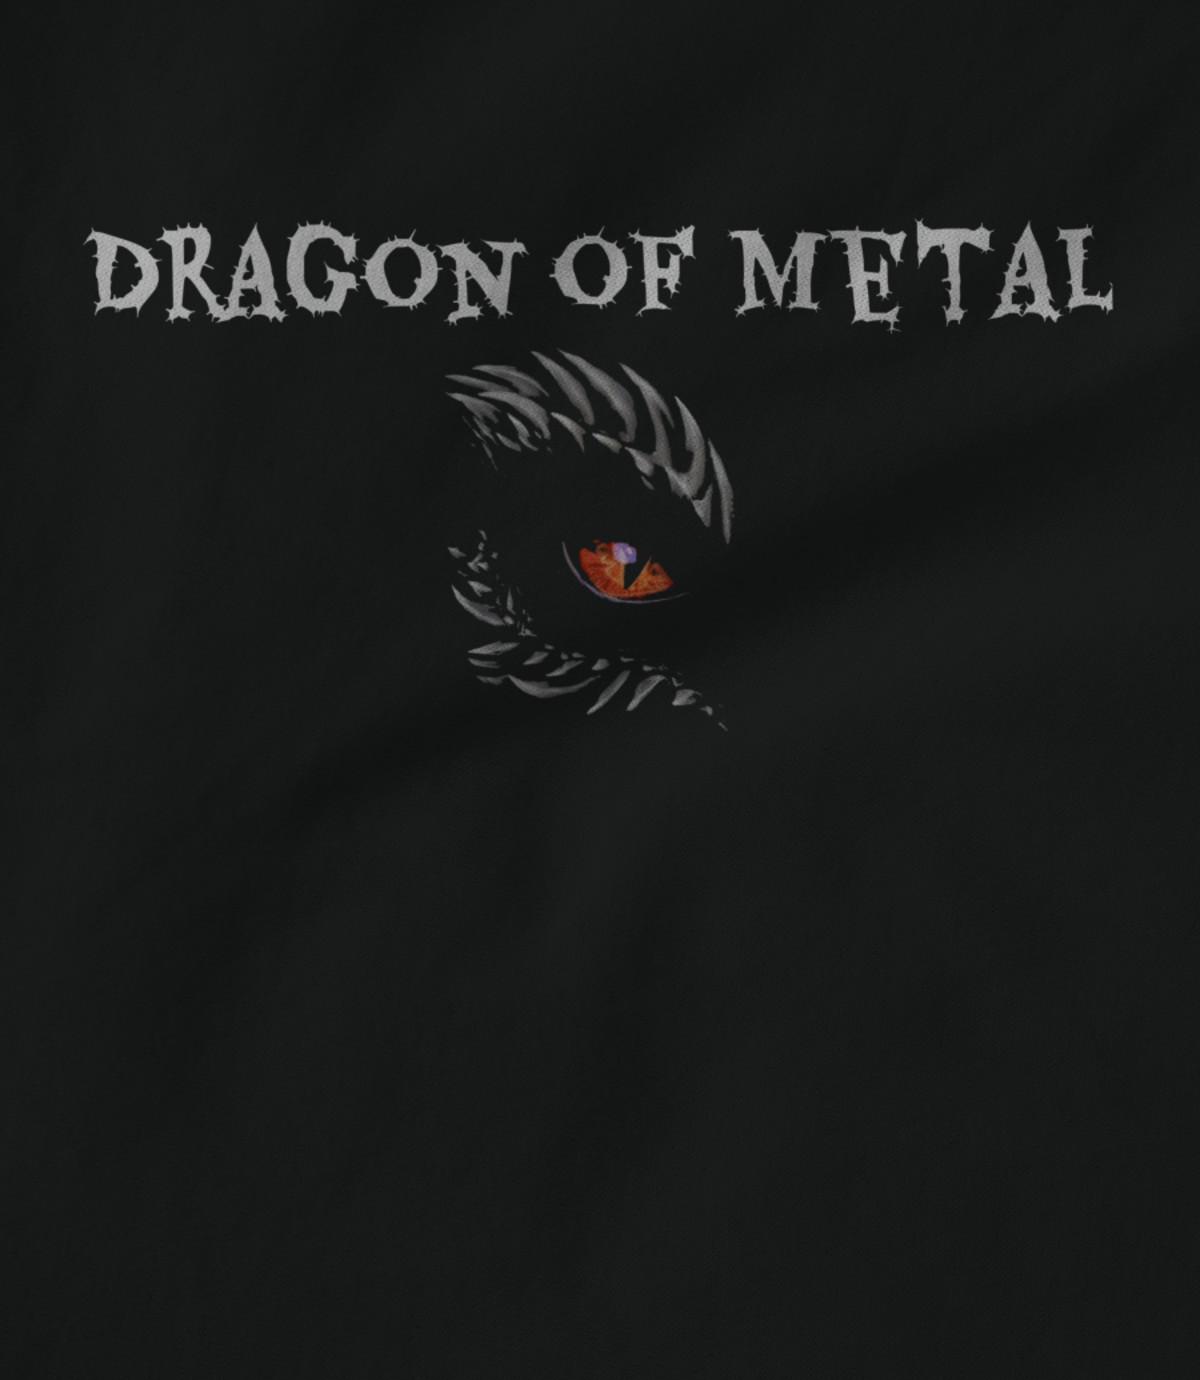 Tin moon dragon eye on you 1495828570